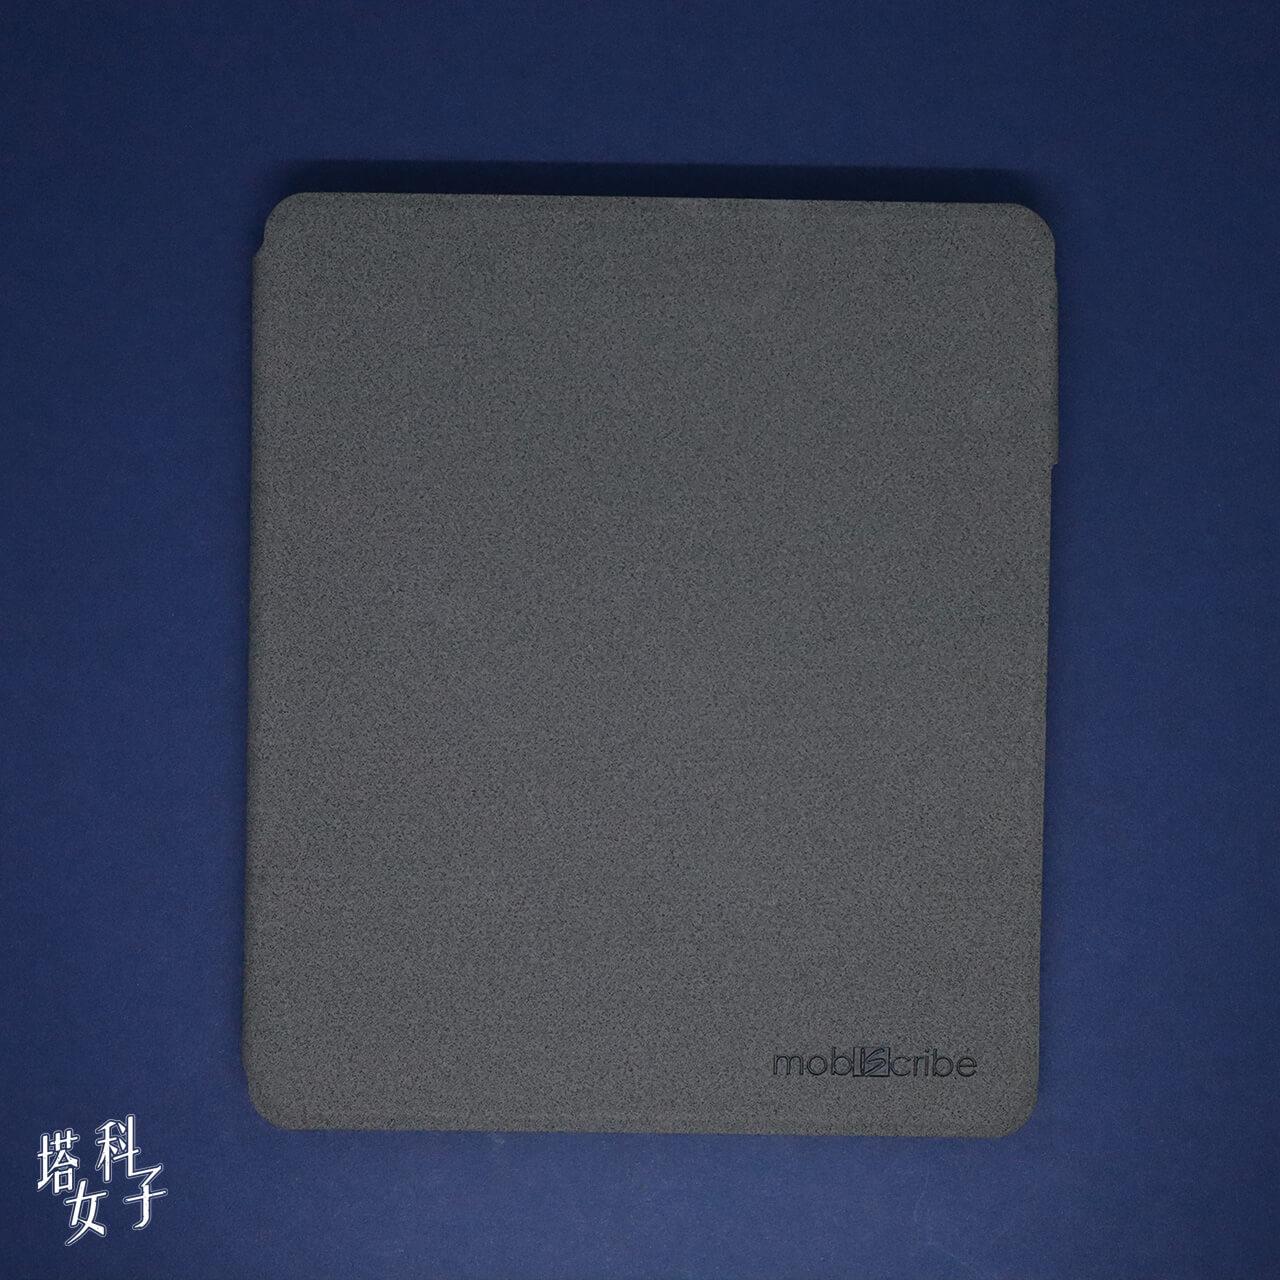 Mobiscribe 電子筆記本/閱讀器 保護套